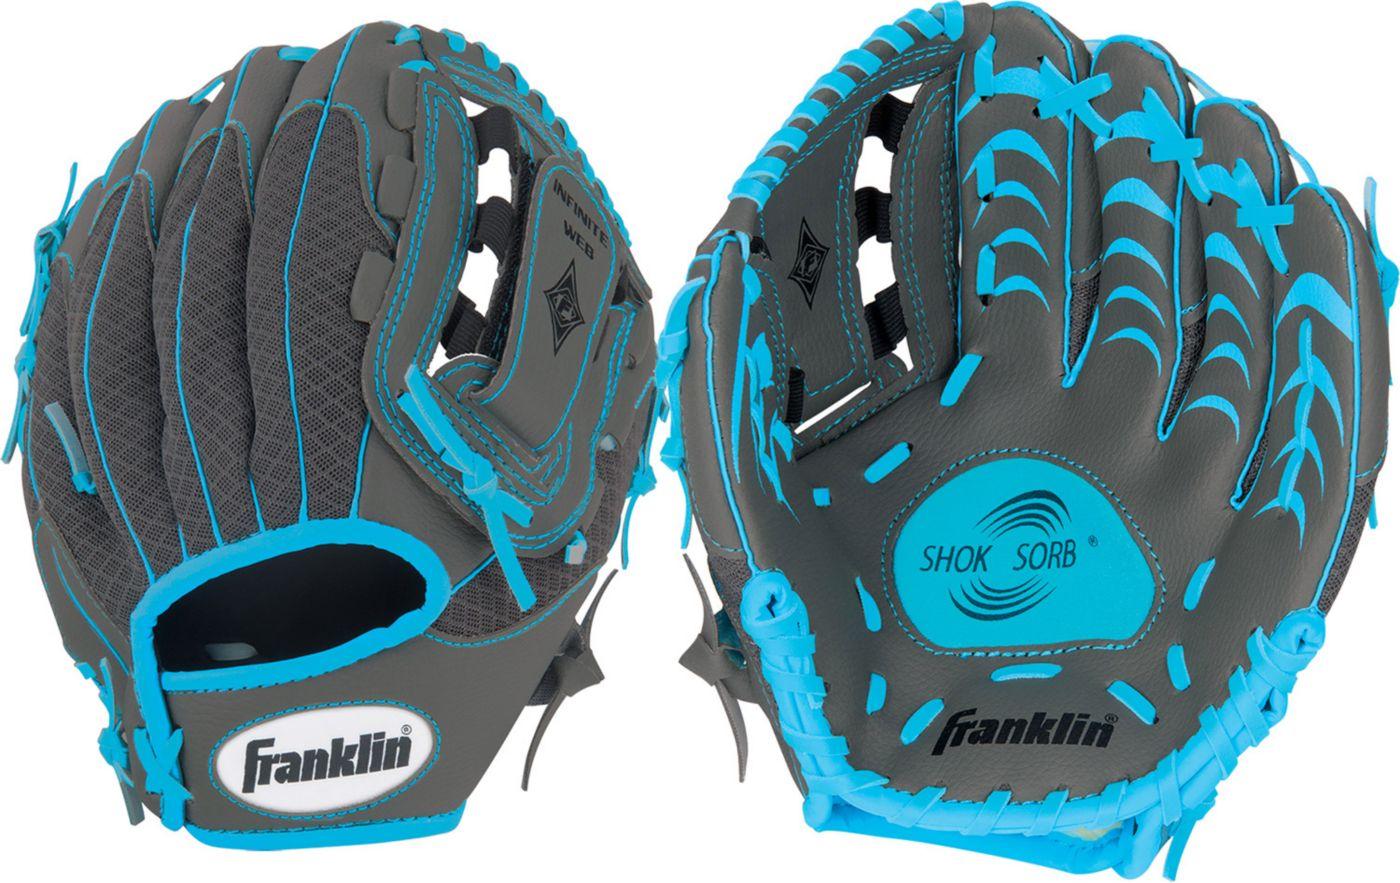 "Franklin 10.5"" T-Ball Shok-Sorb Infinite Series Glove"